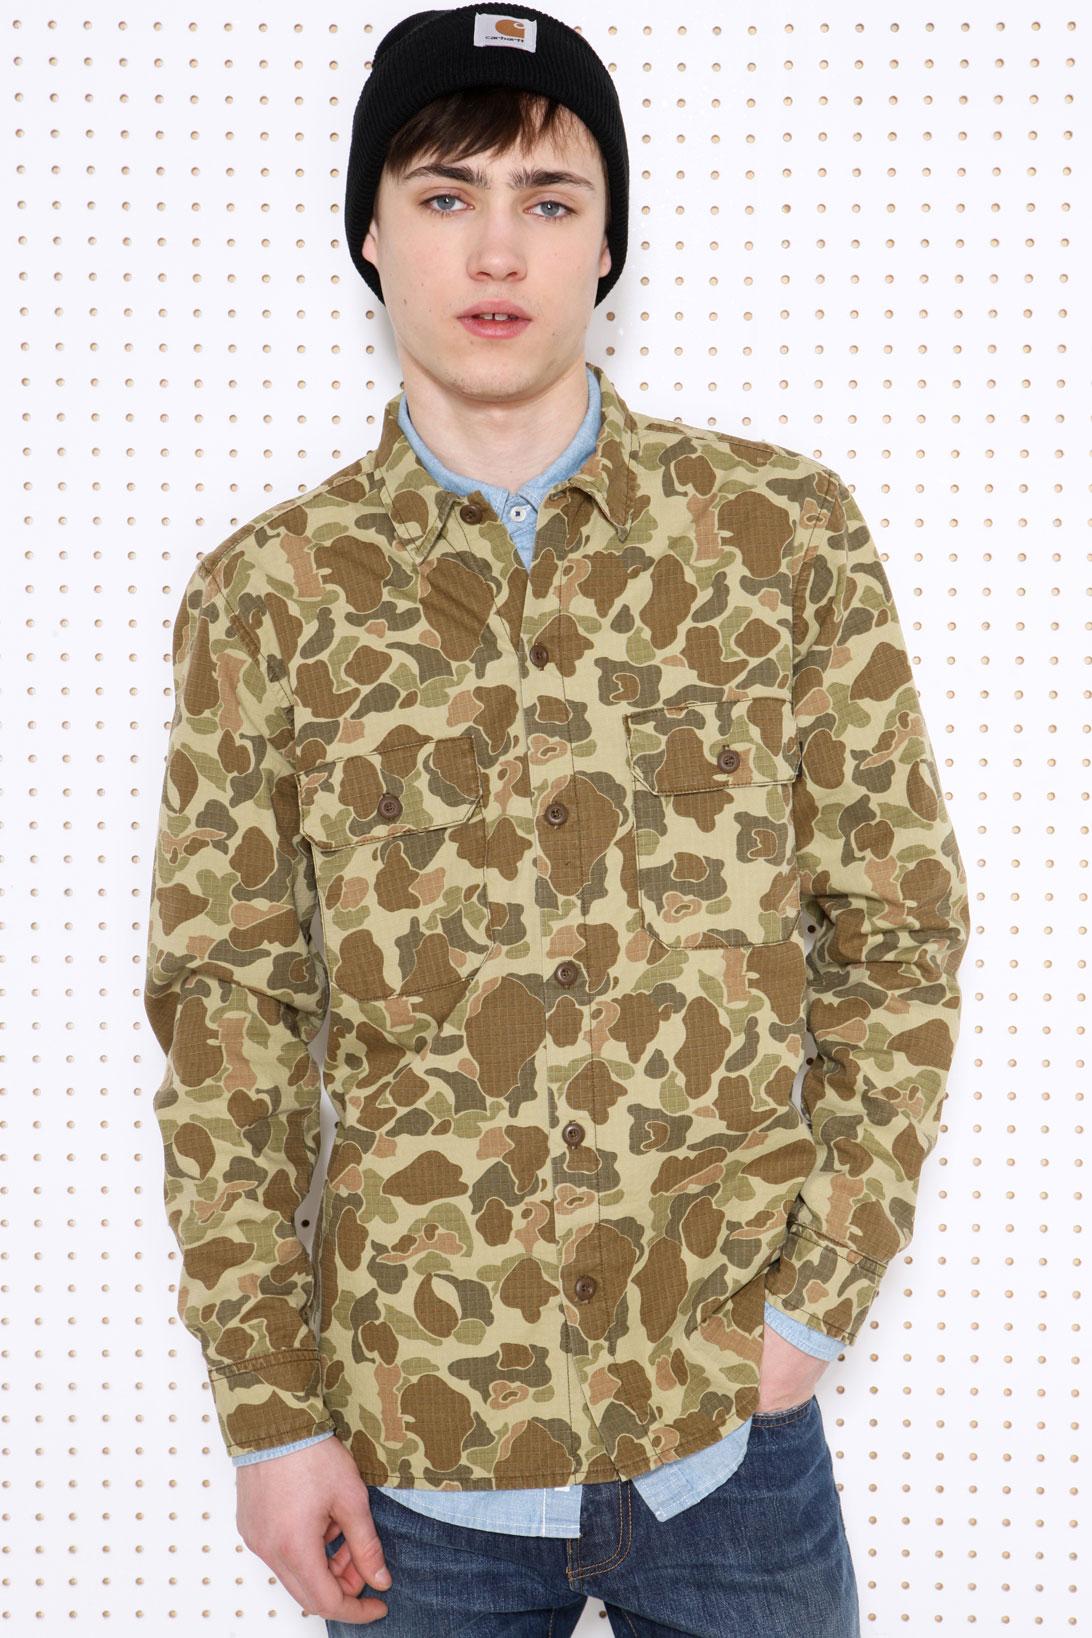 Carhartt-veste-camouflage-duck-hunter-solde-lecatalog.com